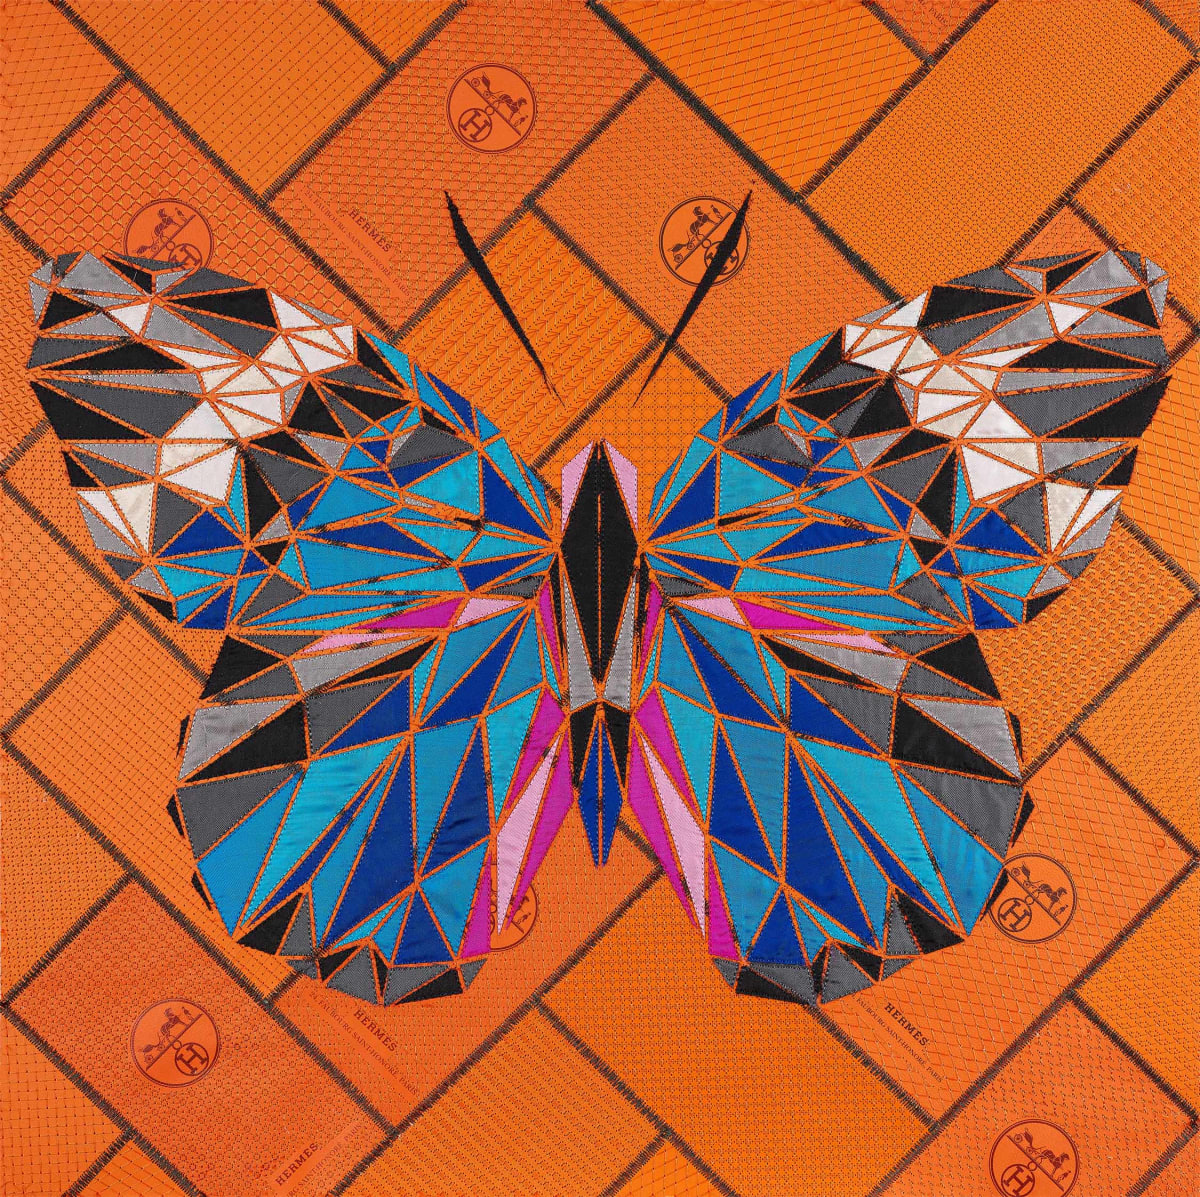 Stephen Wilson, Prism Flutter, 2020